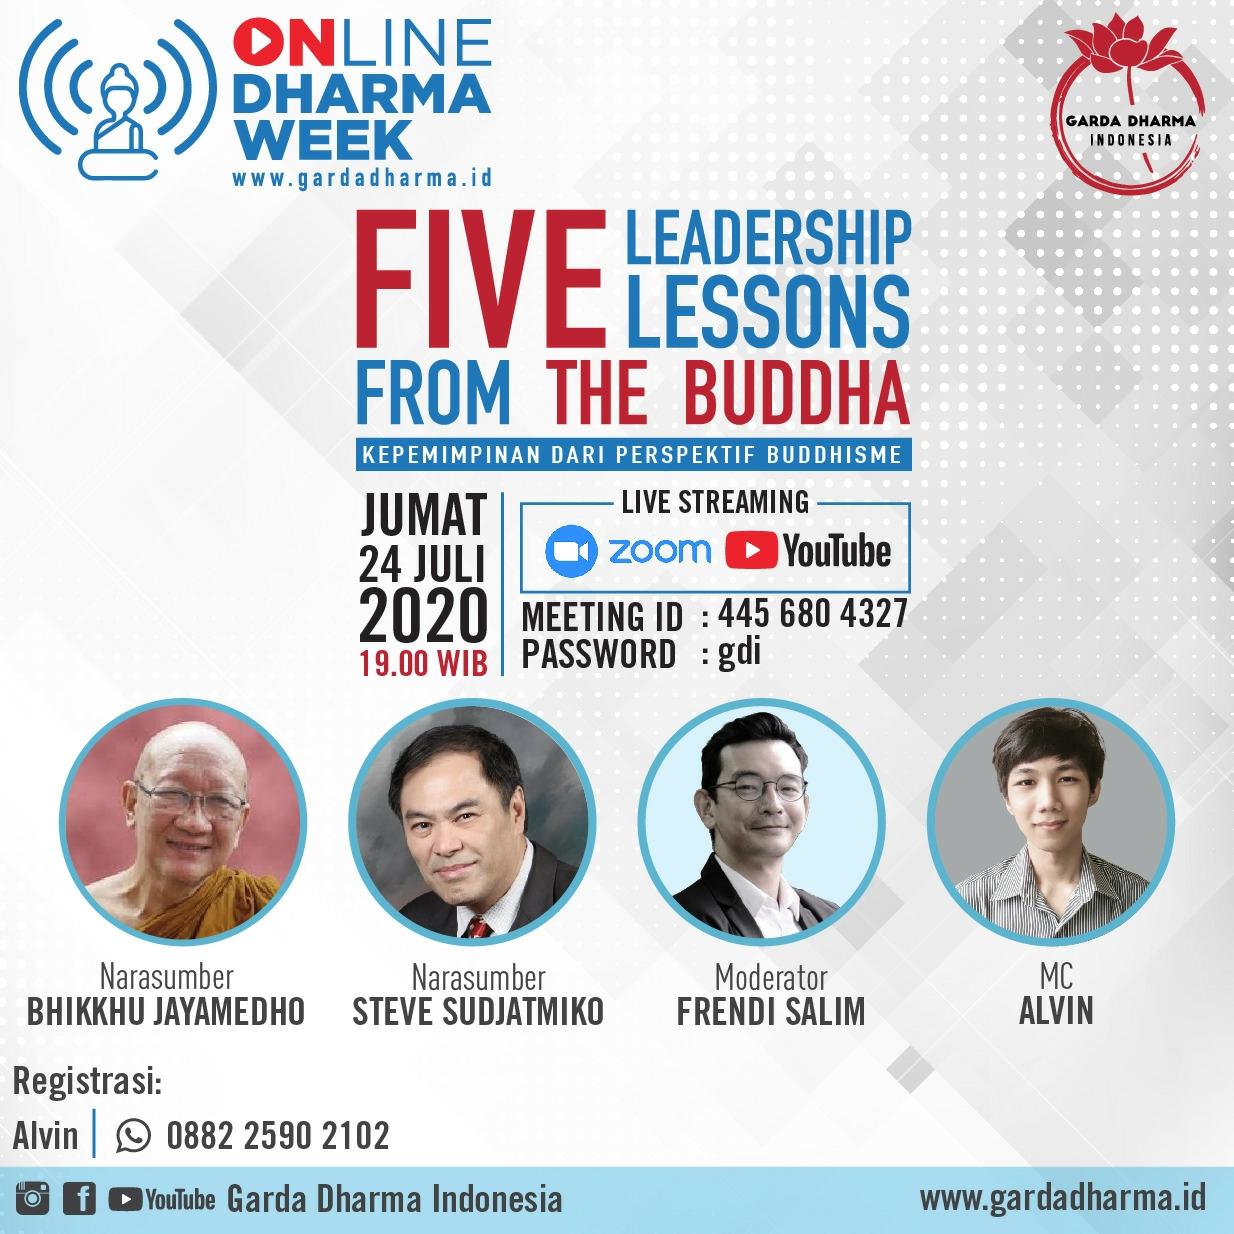 Five Leadership Lessons From The Buddha bersama Bhikkhu Jayamedho dan Steve Sudjatmiko